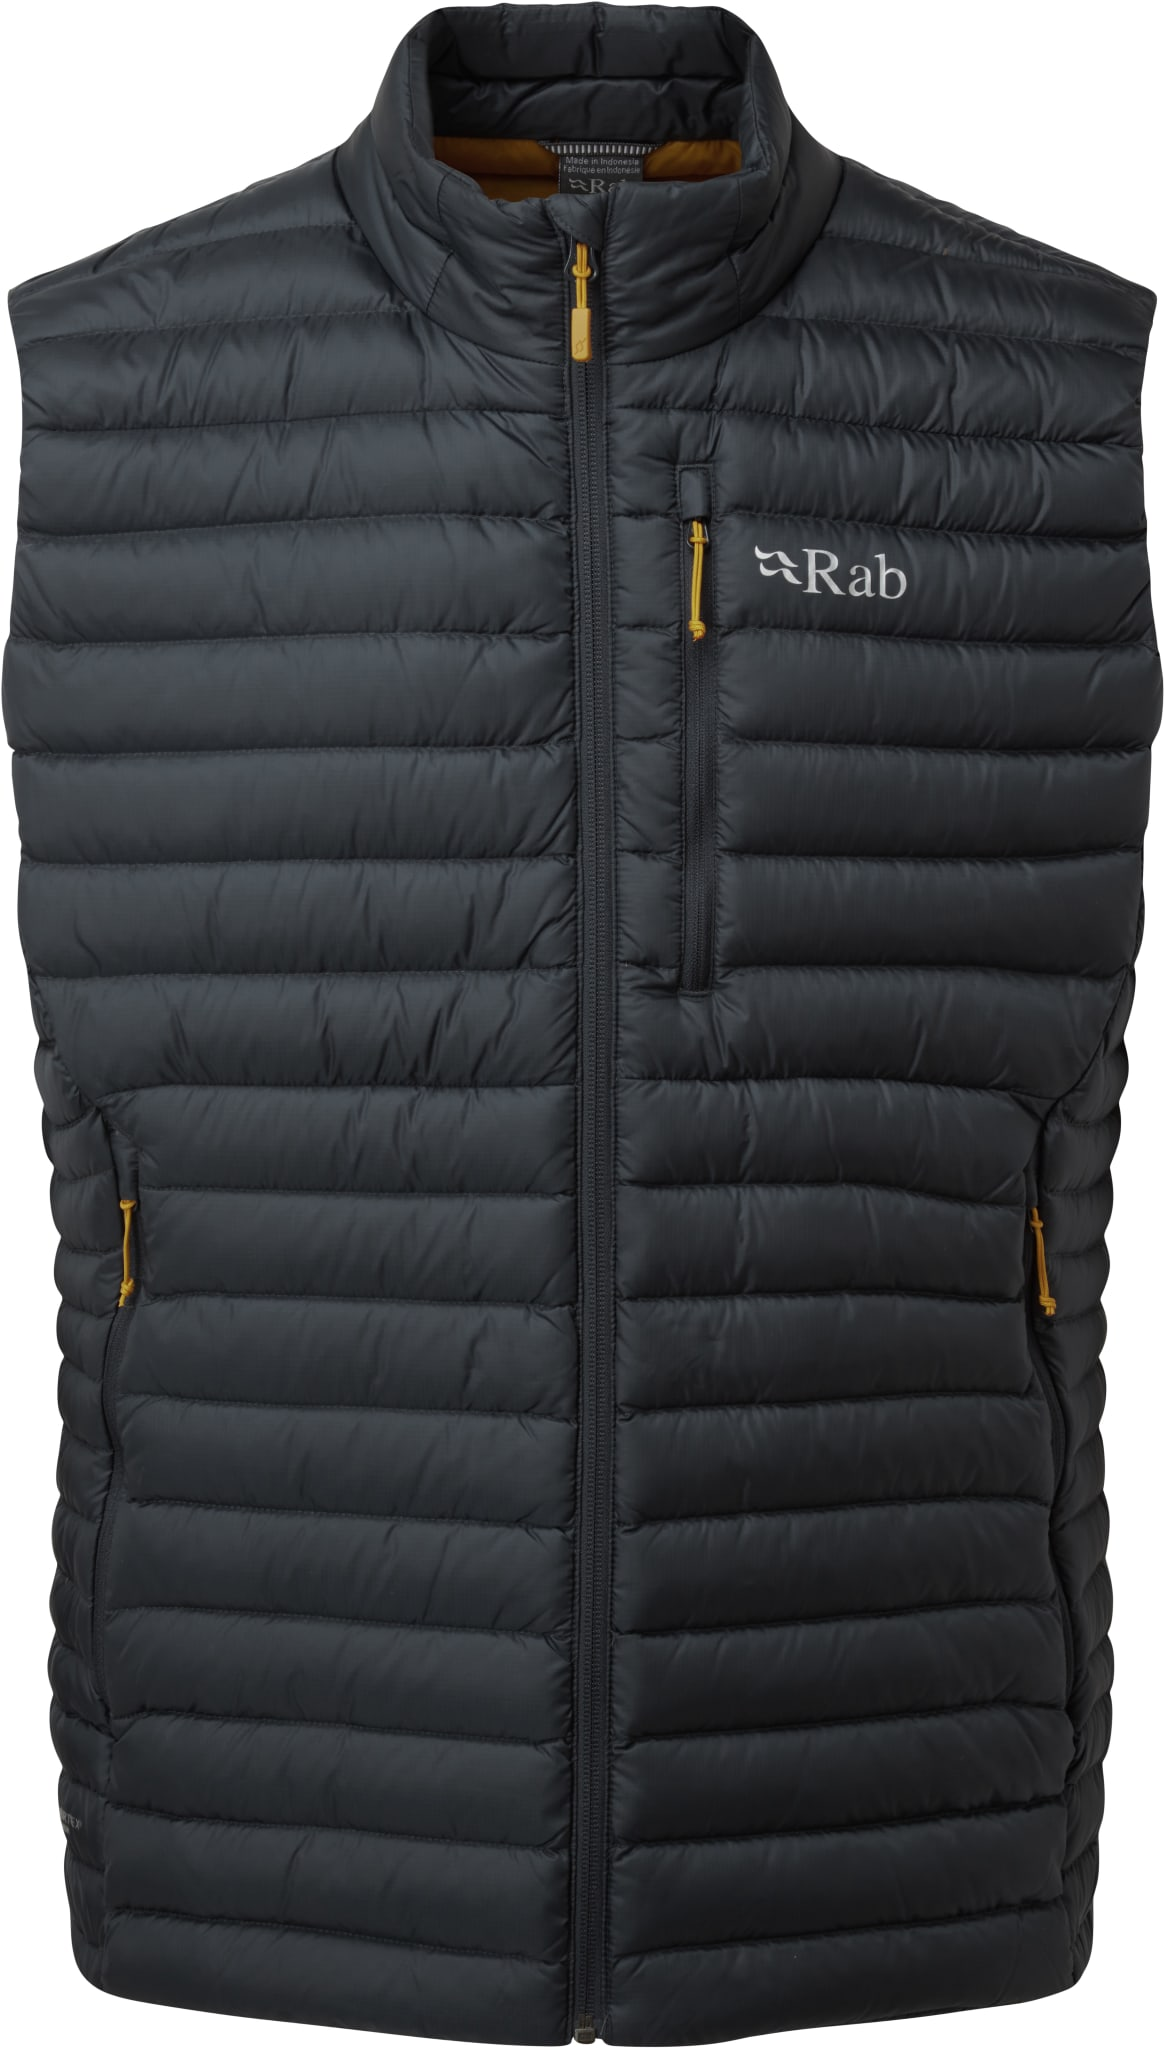 Microlight Vest Ms